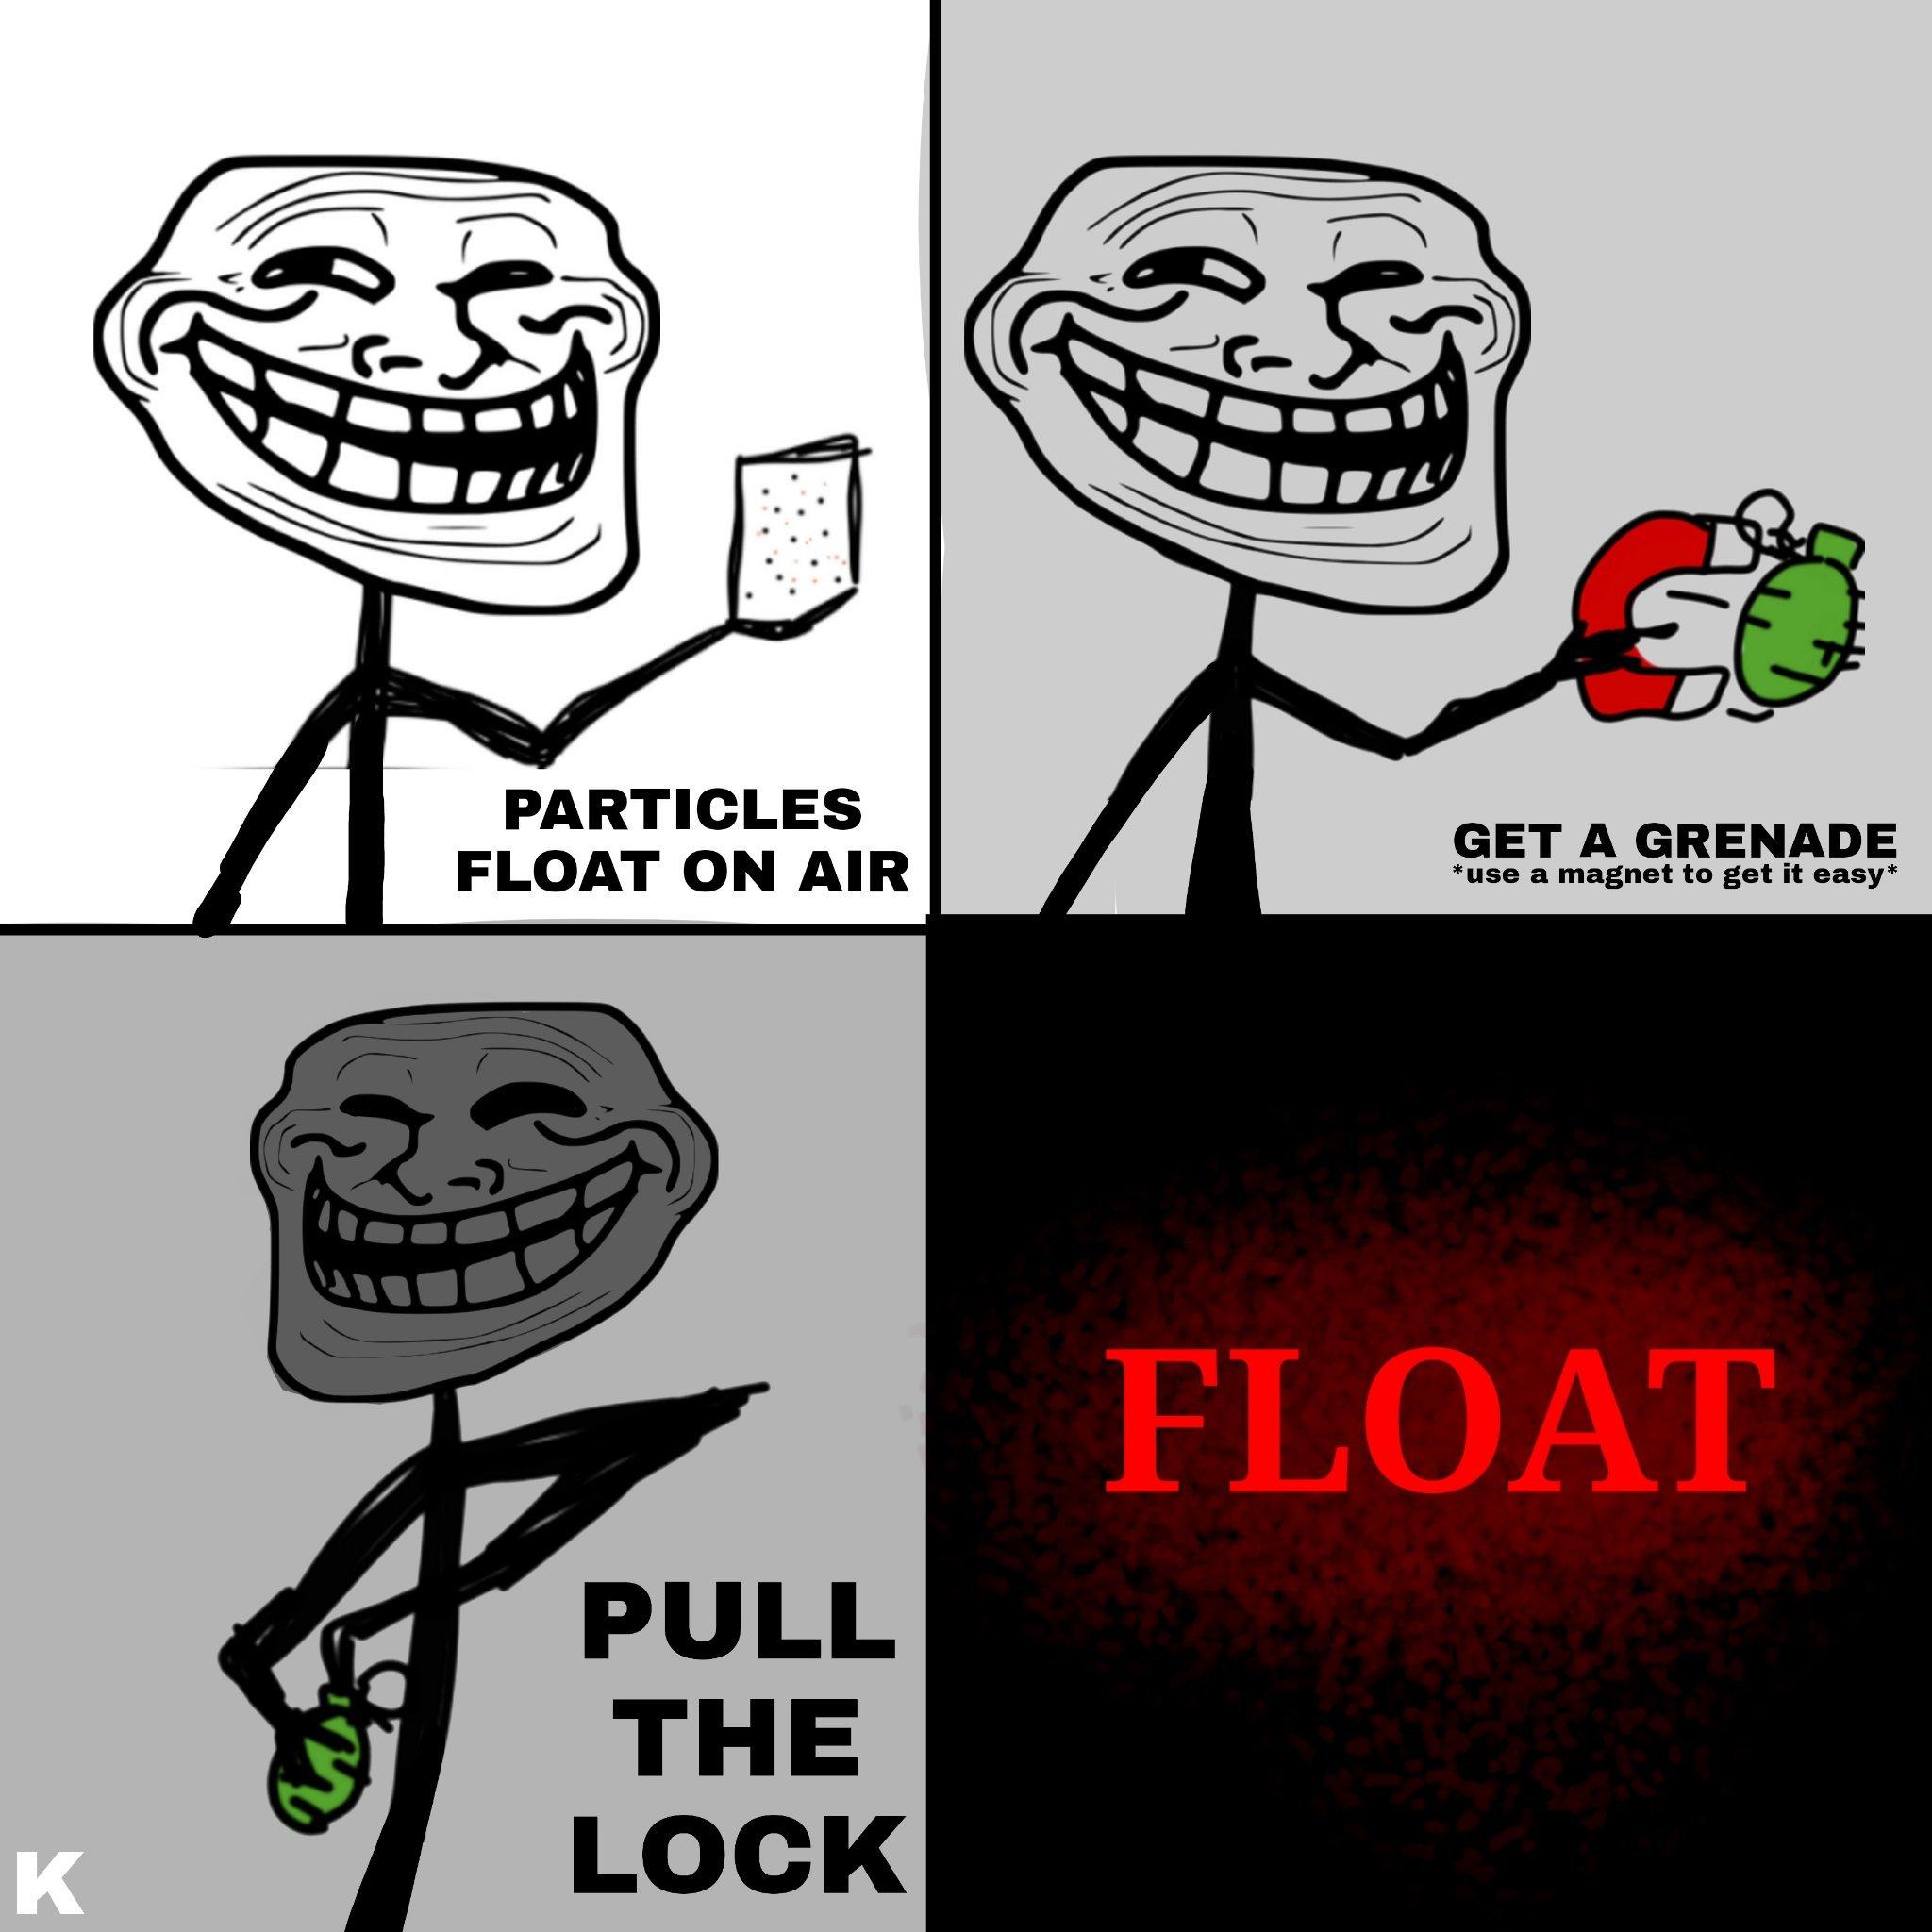 WANNA FLOAT, si no entendiste aprende inglés - meme